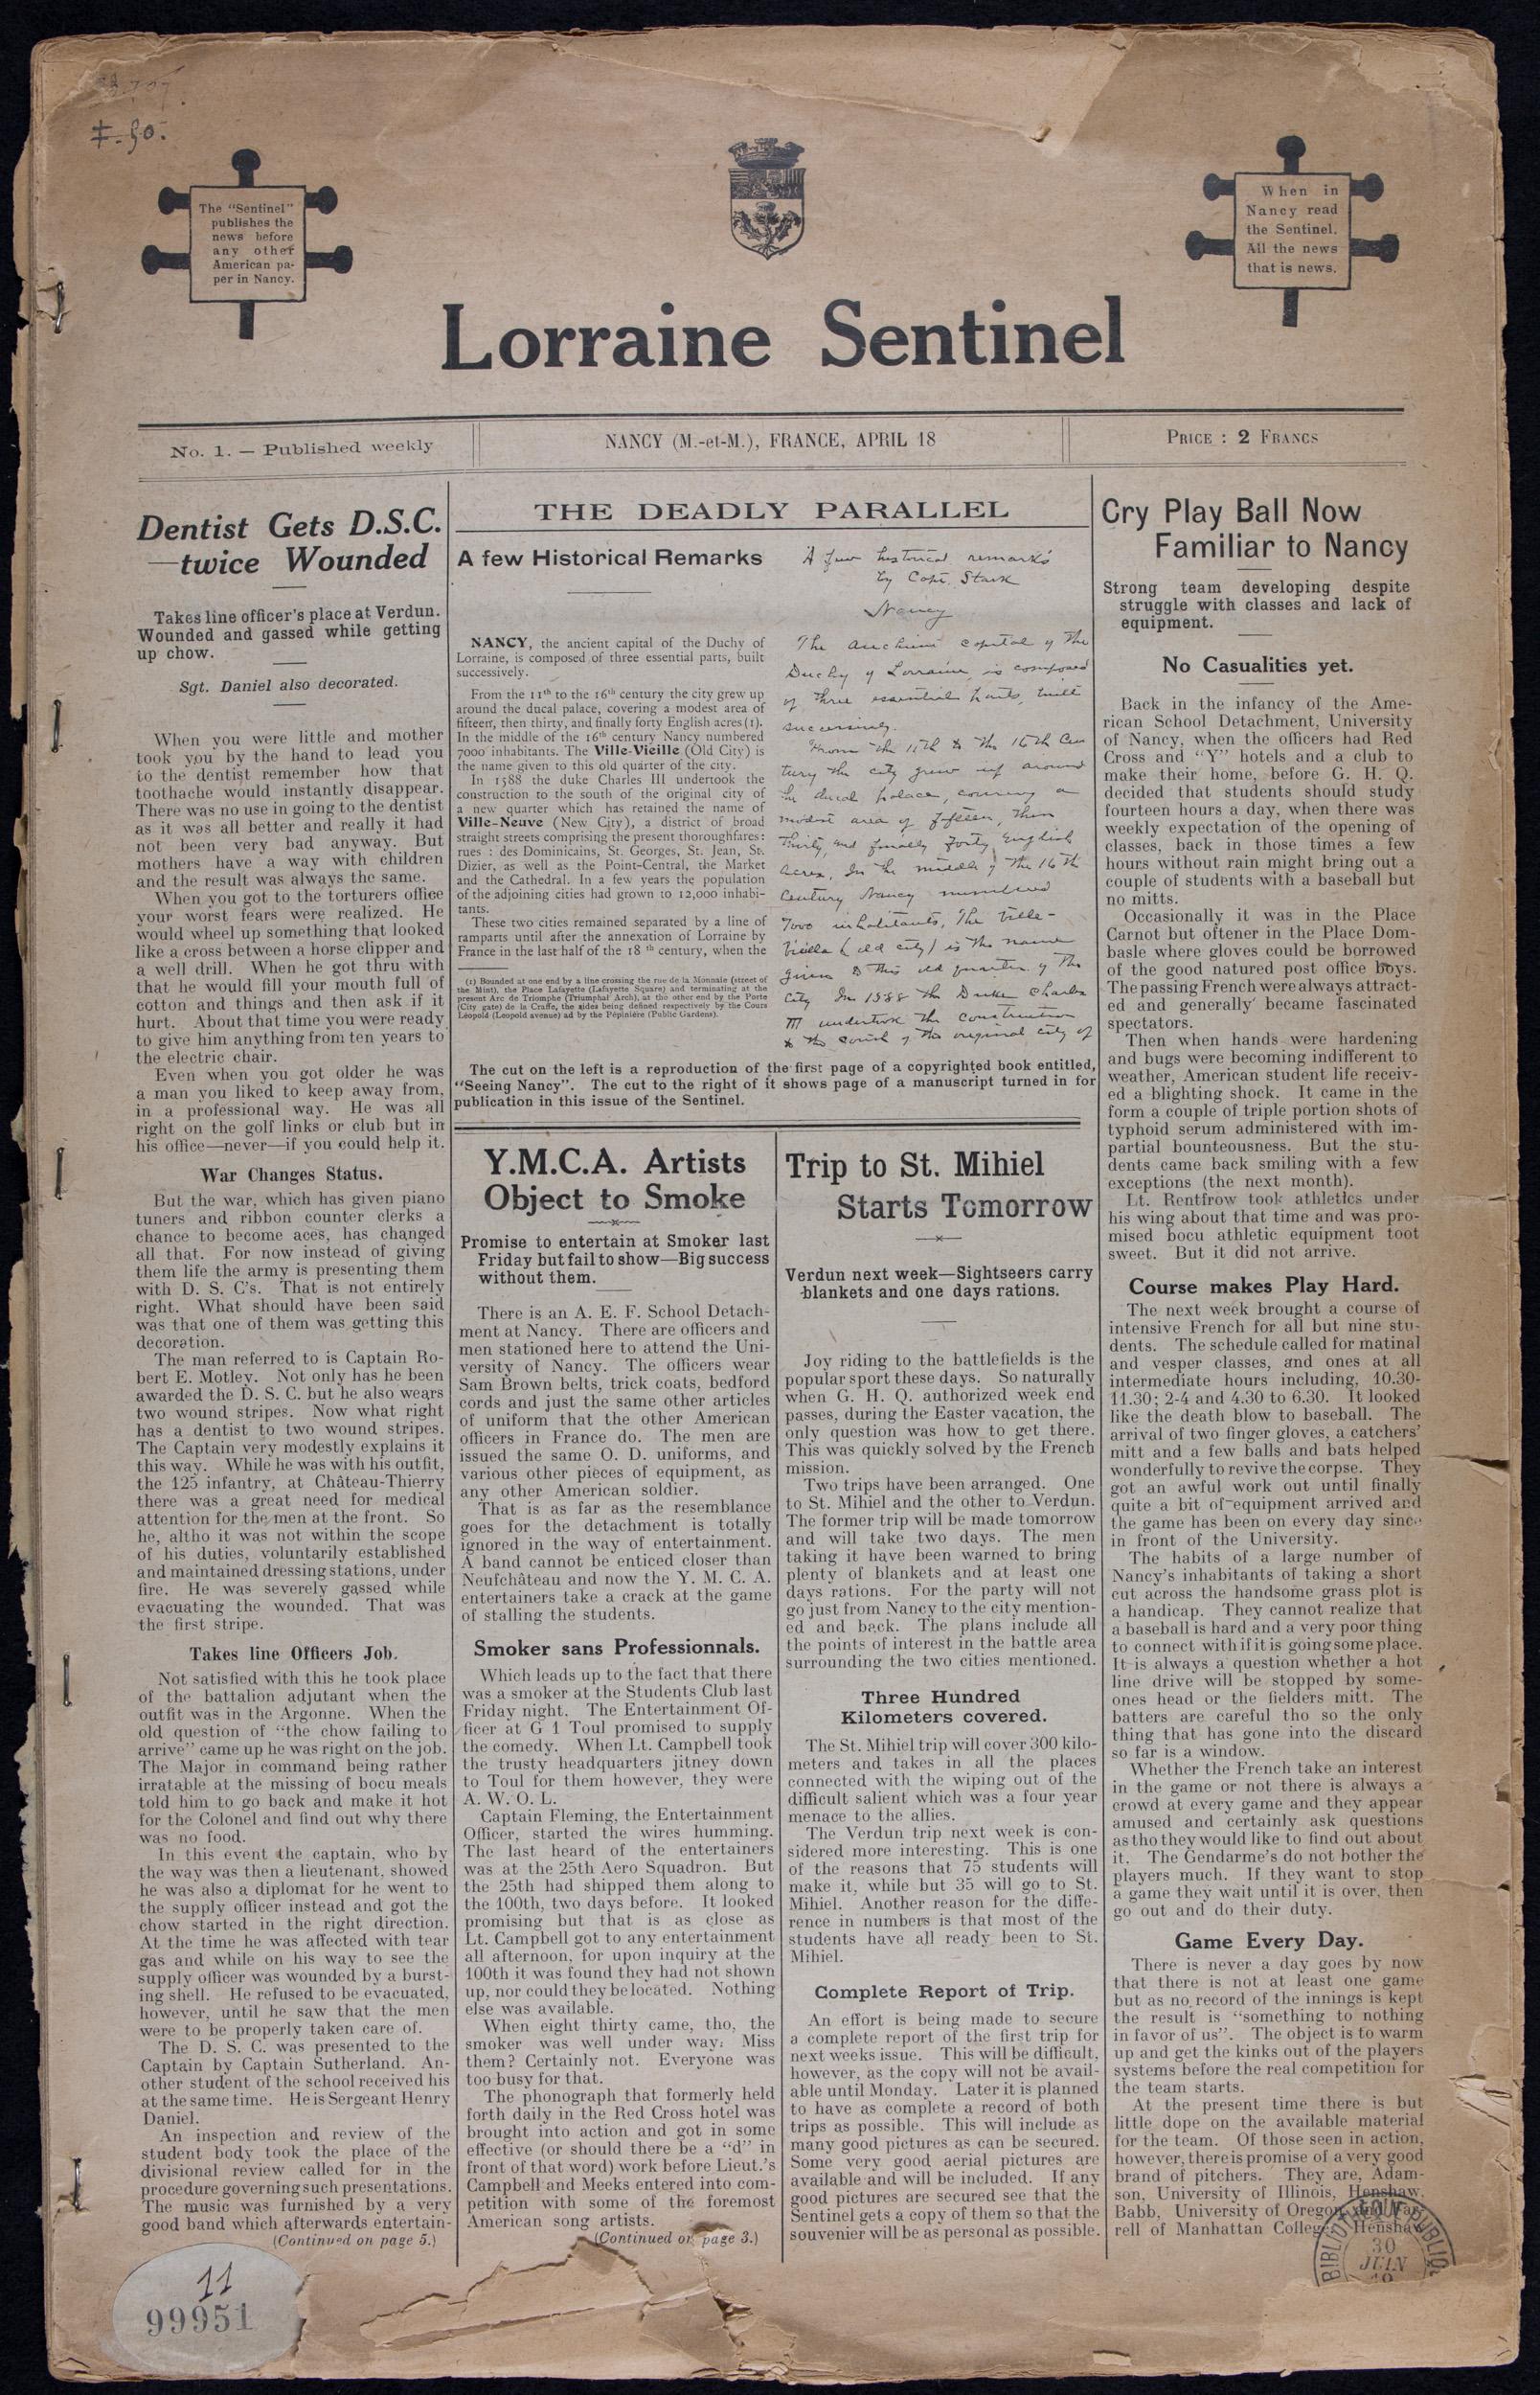 Nancy, 18 avril-13 juin 1919 (13 numéros). Cote 99 951 (11)